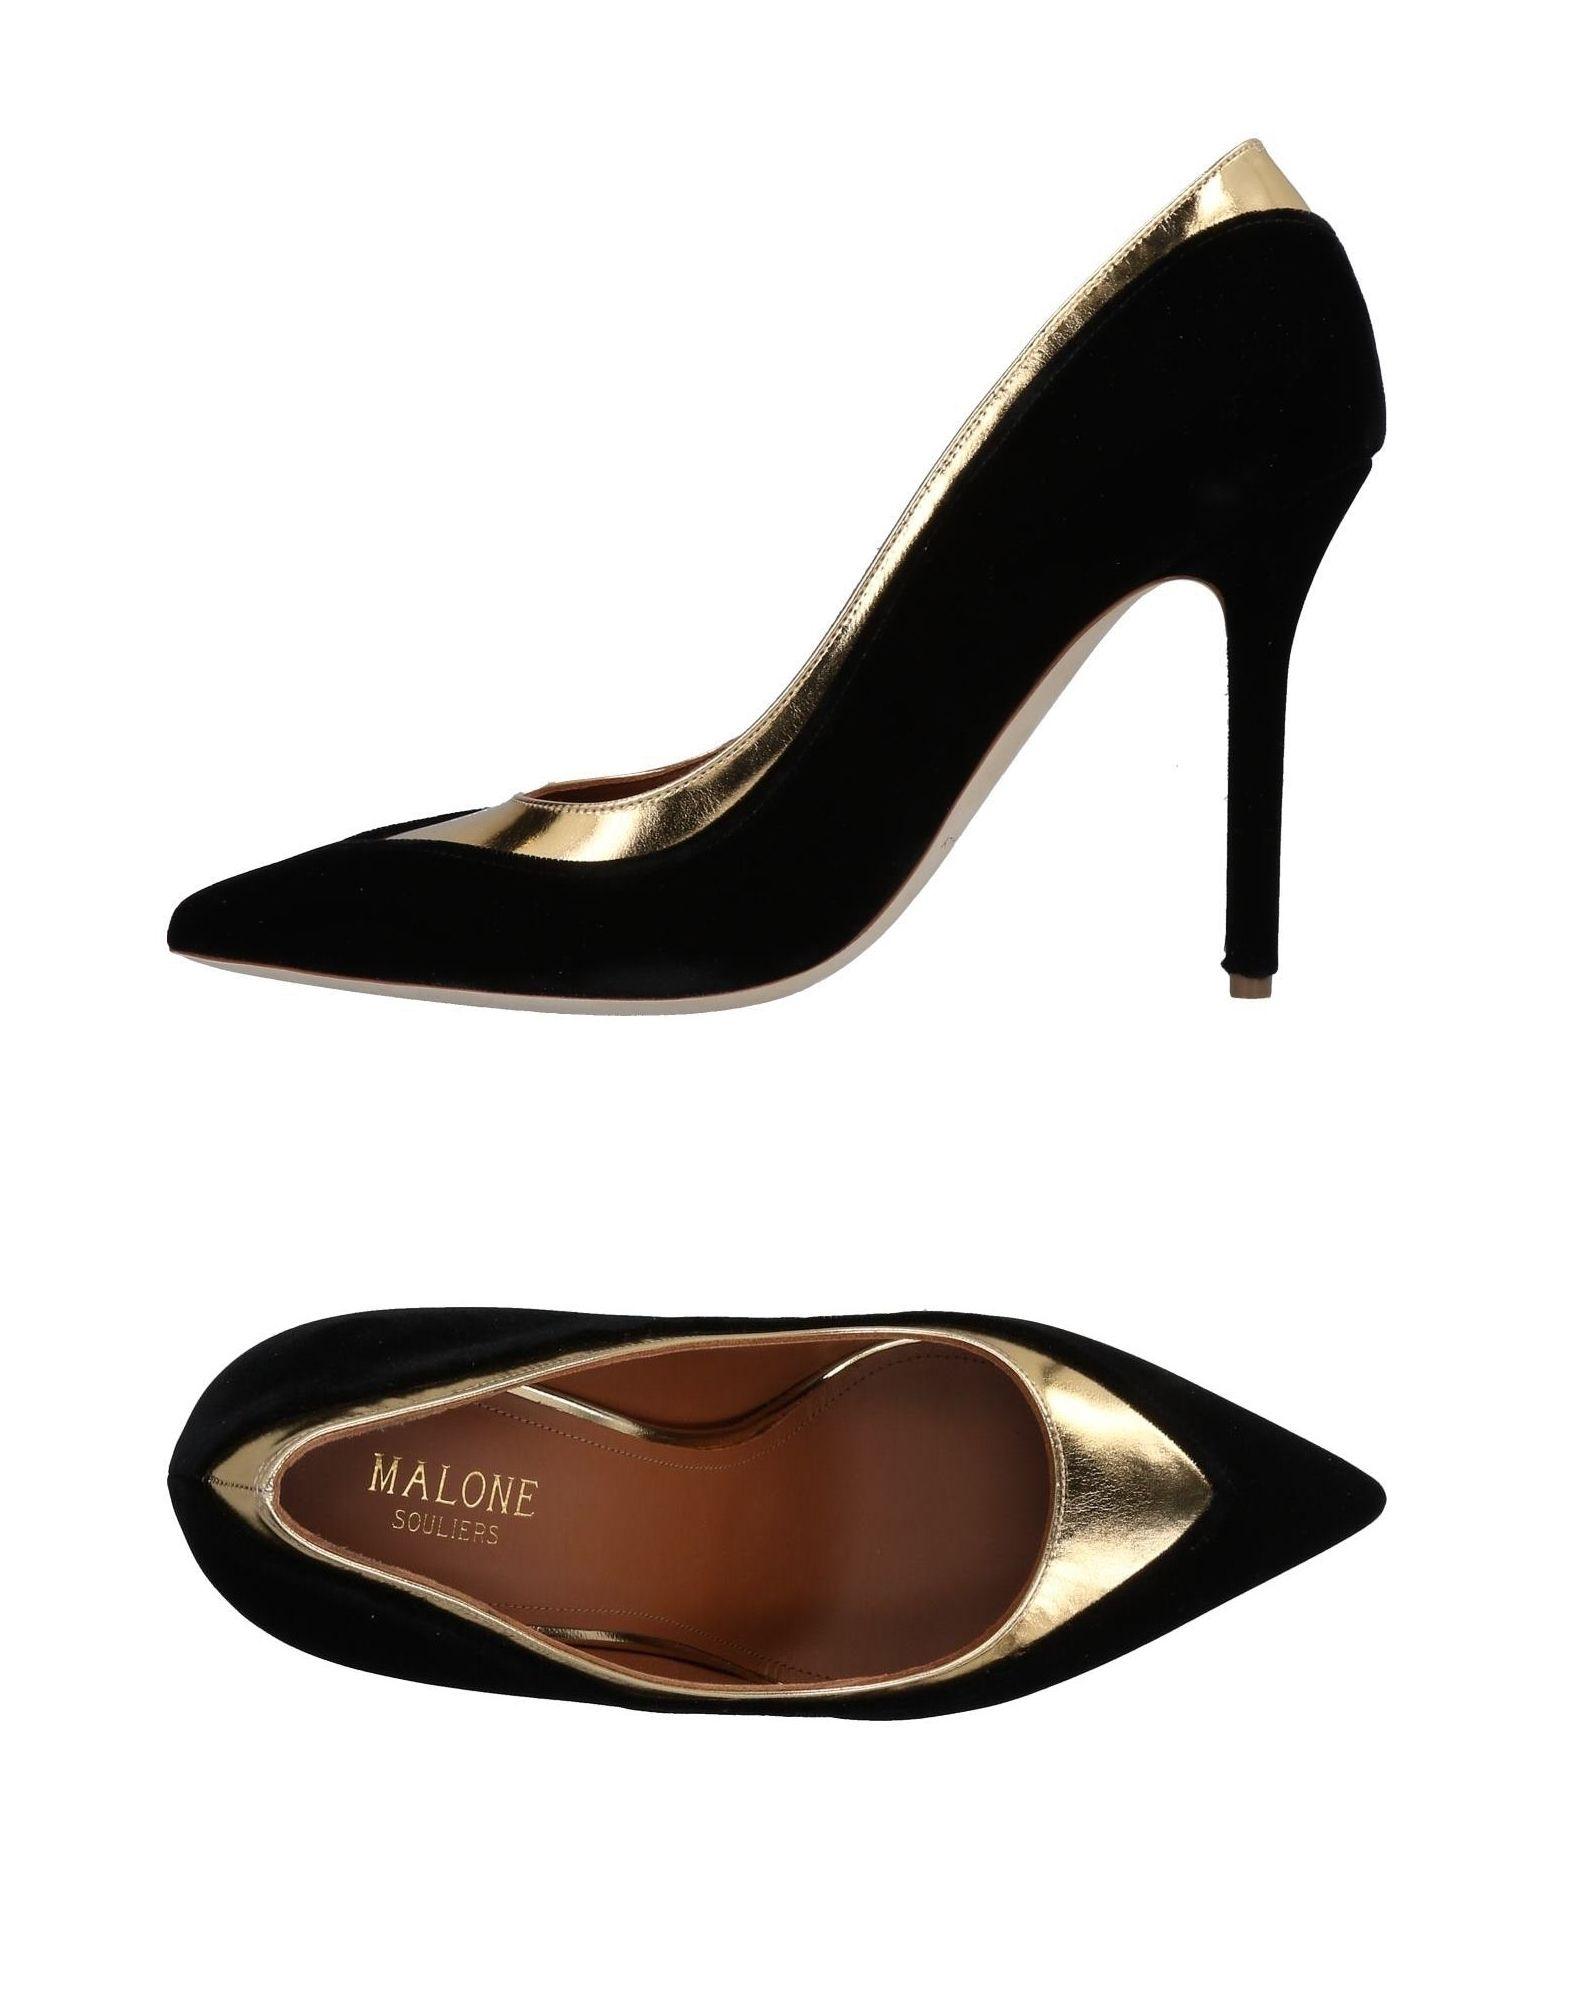 Malone Souliers Pumps Damen  11492309QIGut aussehende strapazierfähige Schuhe